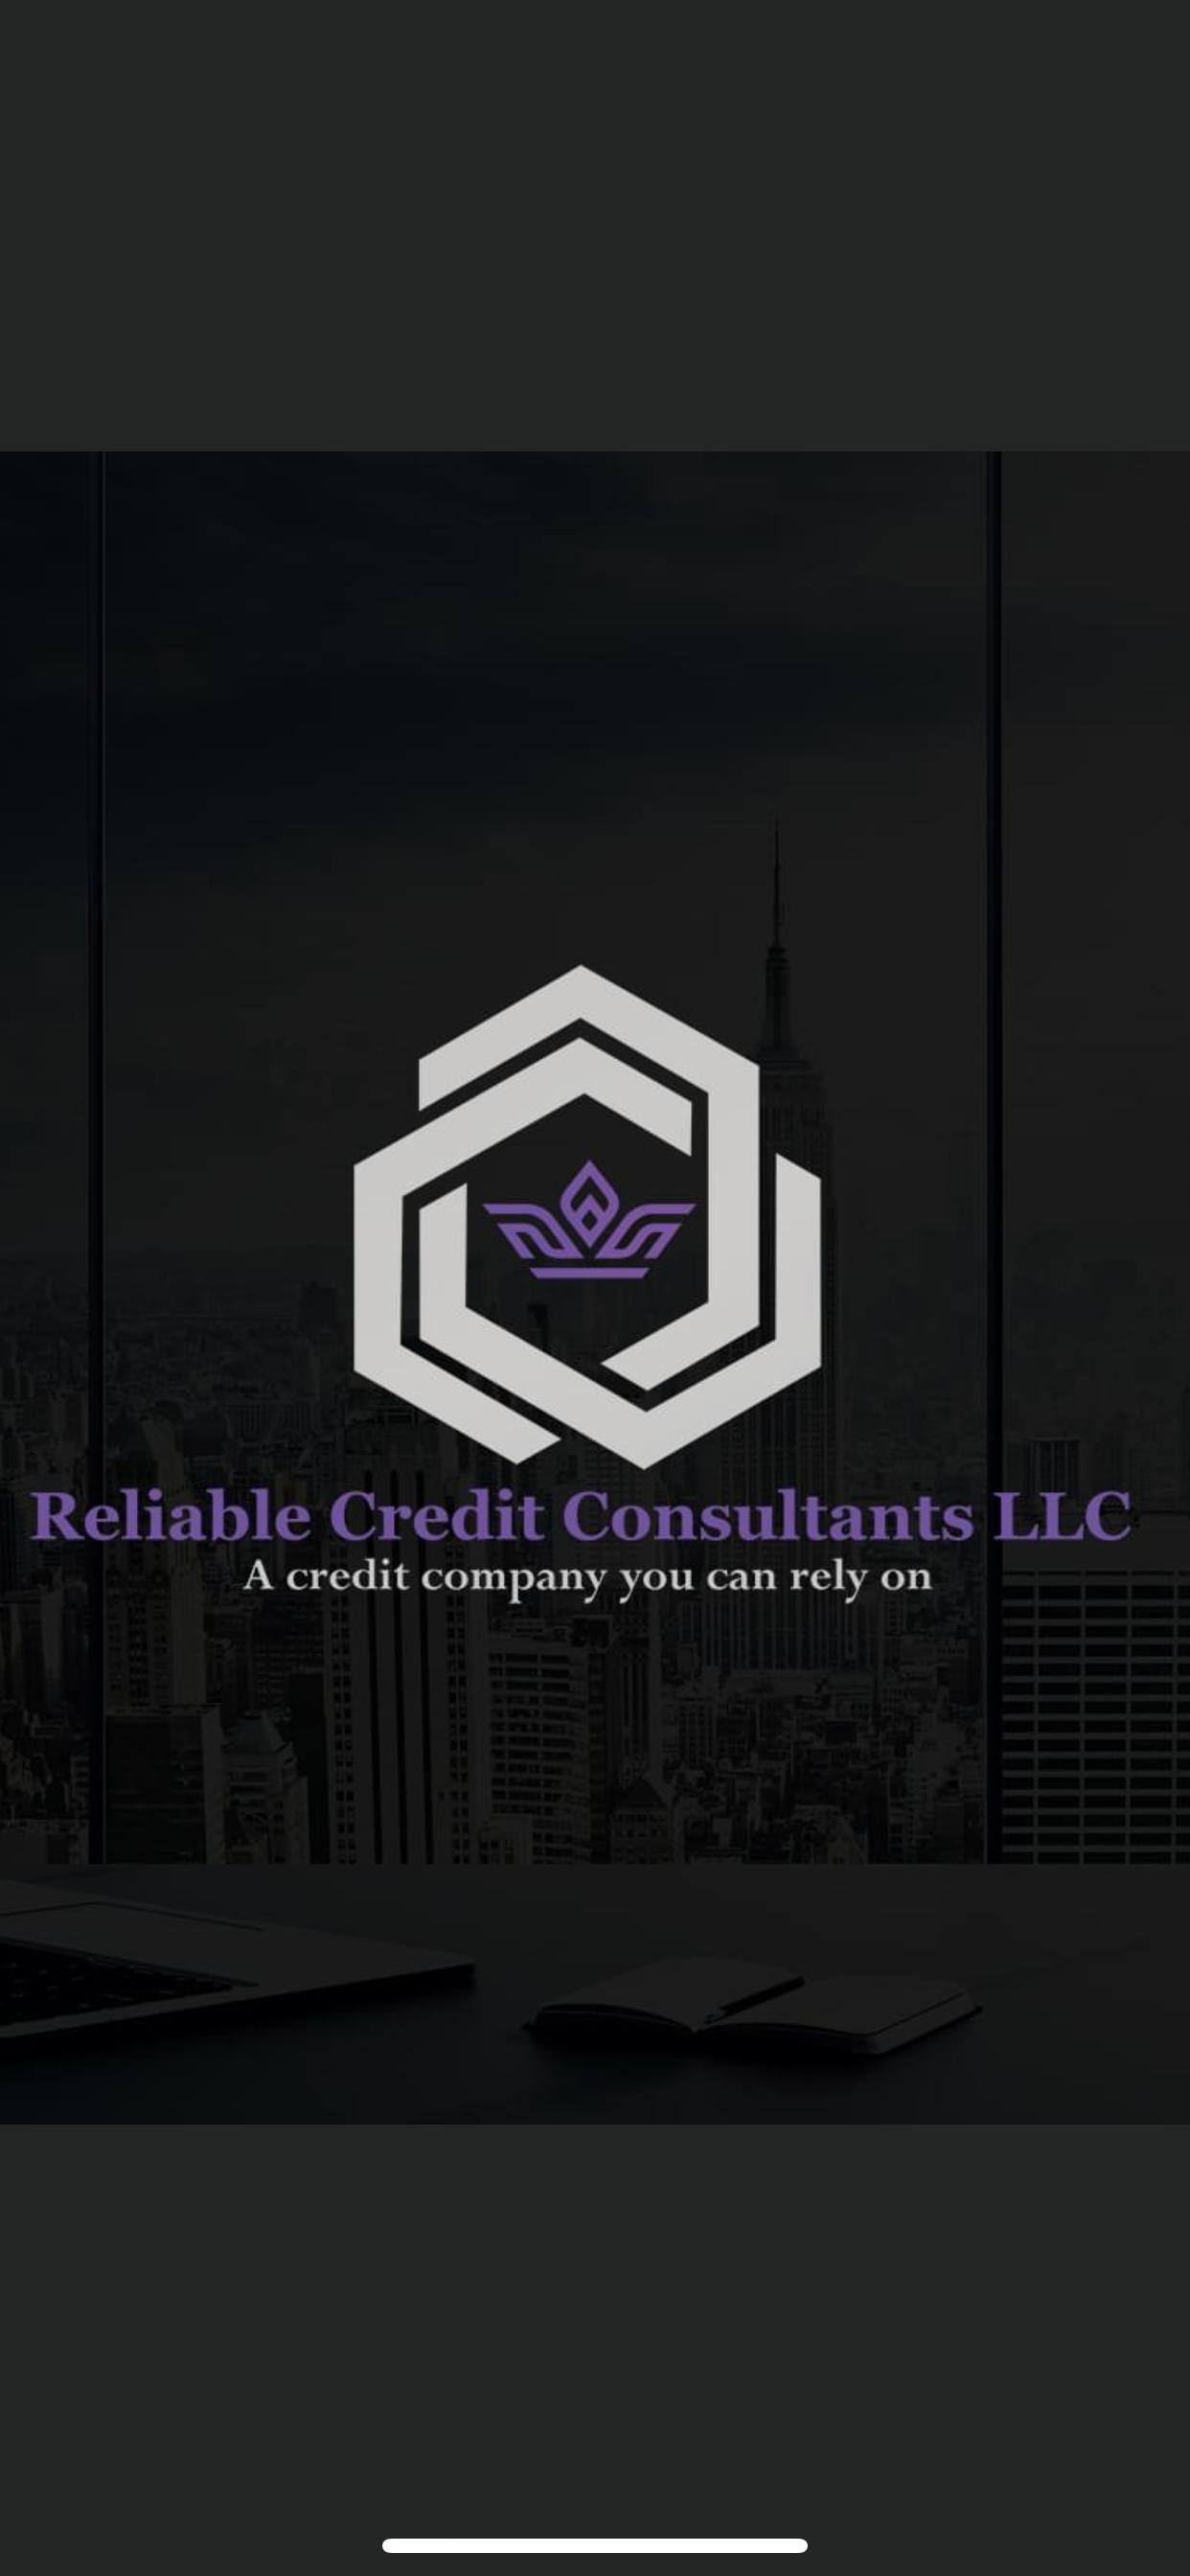 Reliable Credit Consultants LLC